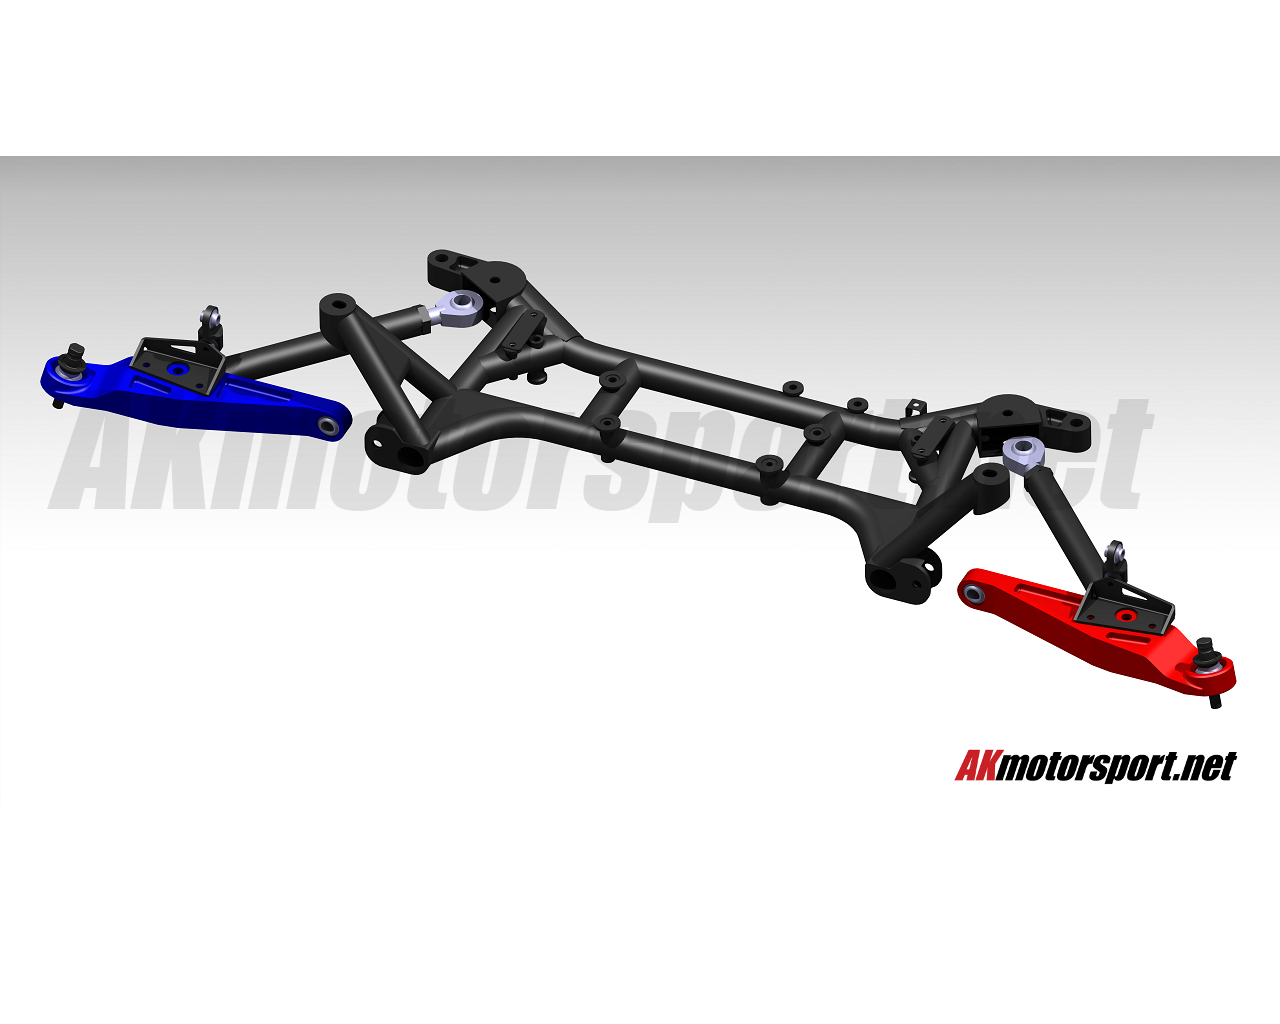 Mitsubishi Lancer EVO X Complete R4 Suspension kit - AKmotorsport.net